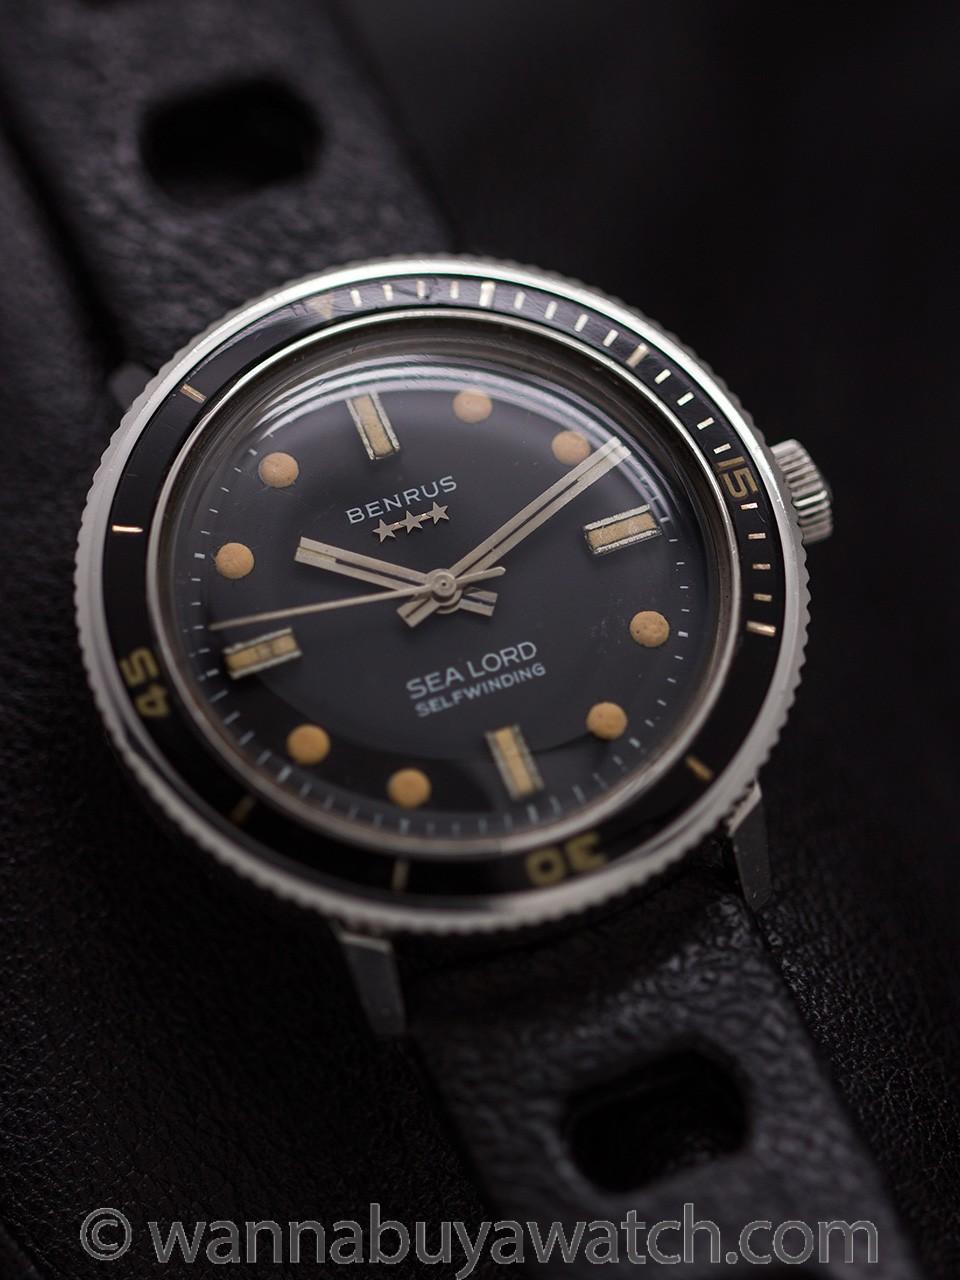 Benrus Sea Lord Diver's circa 1960's